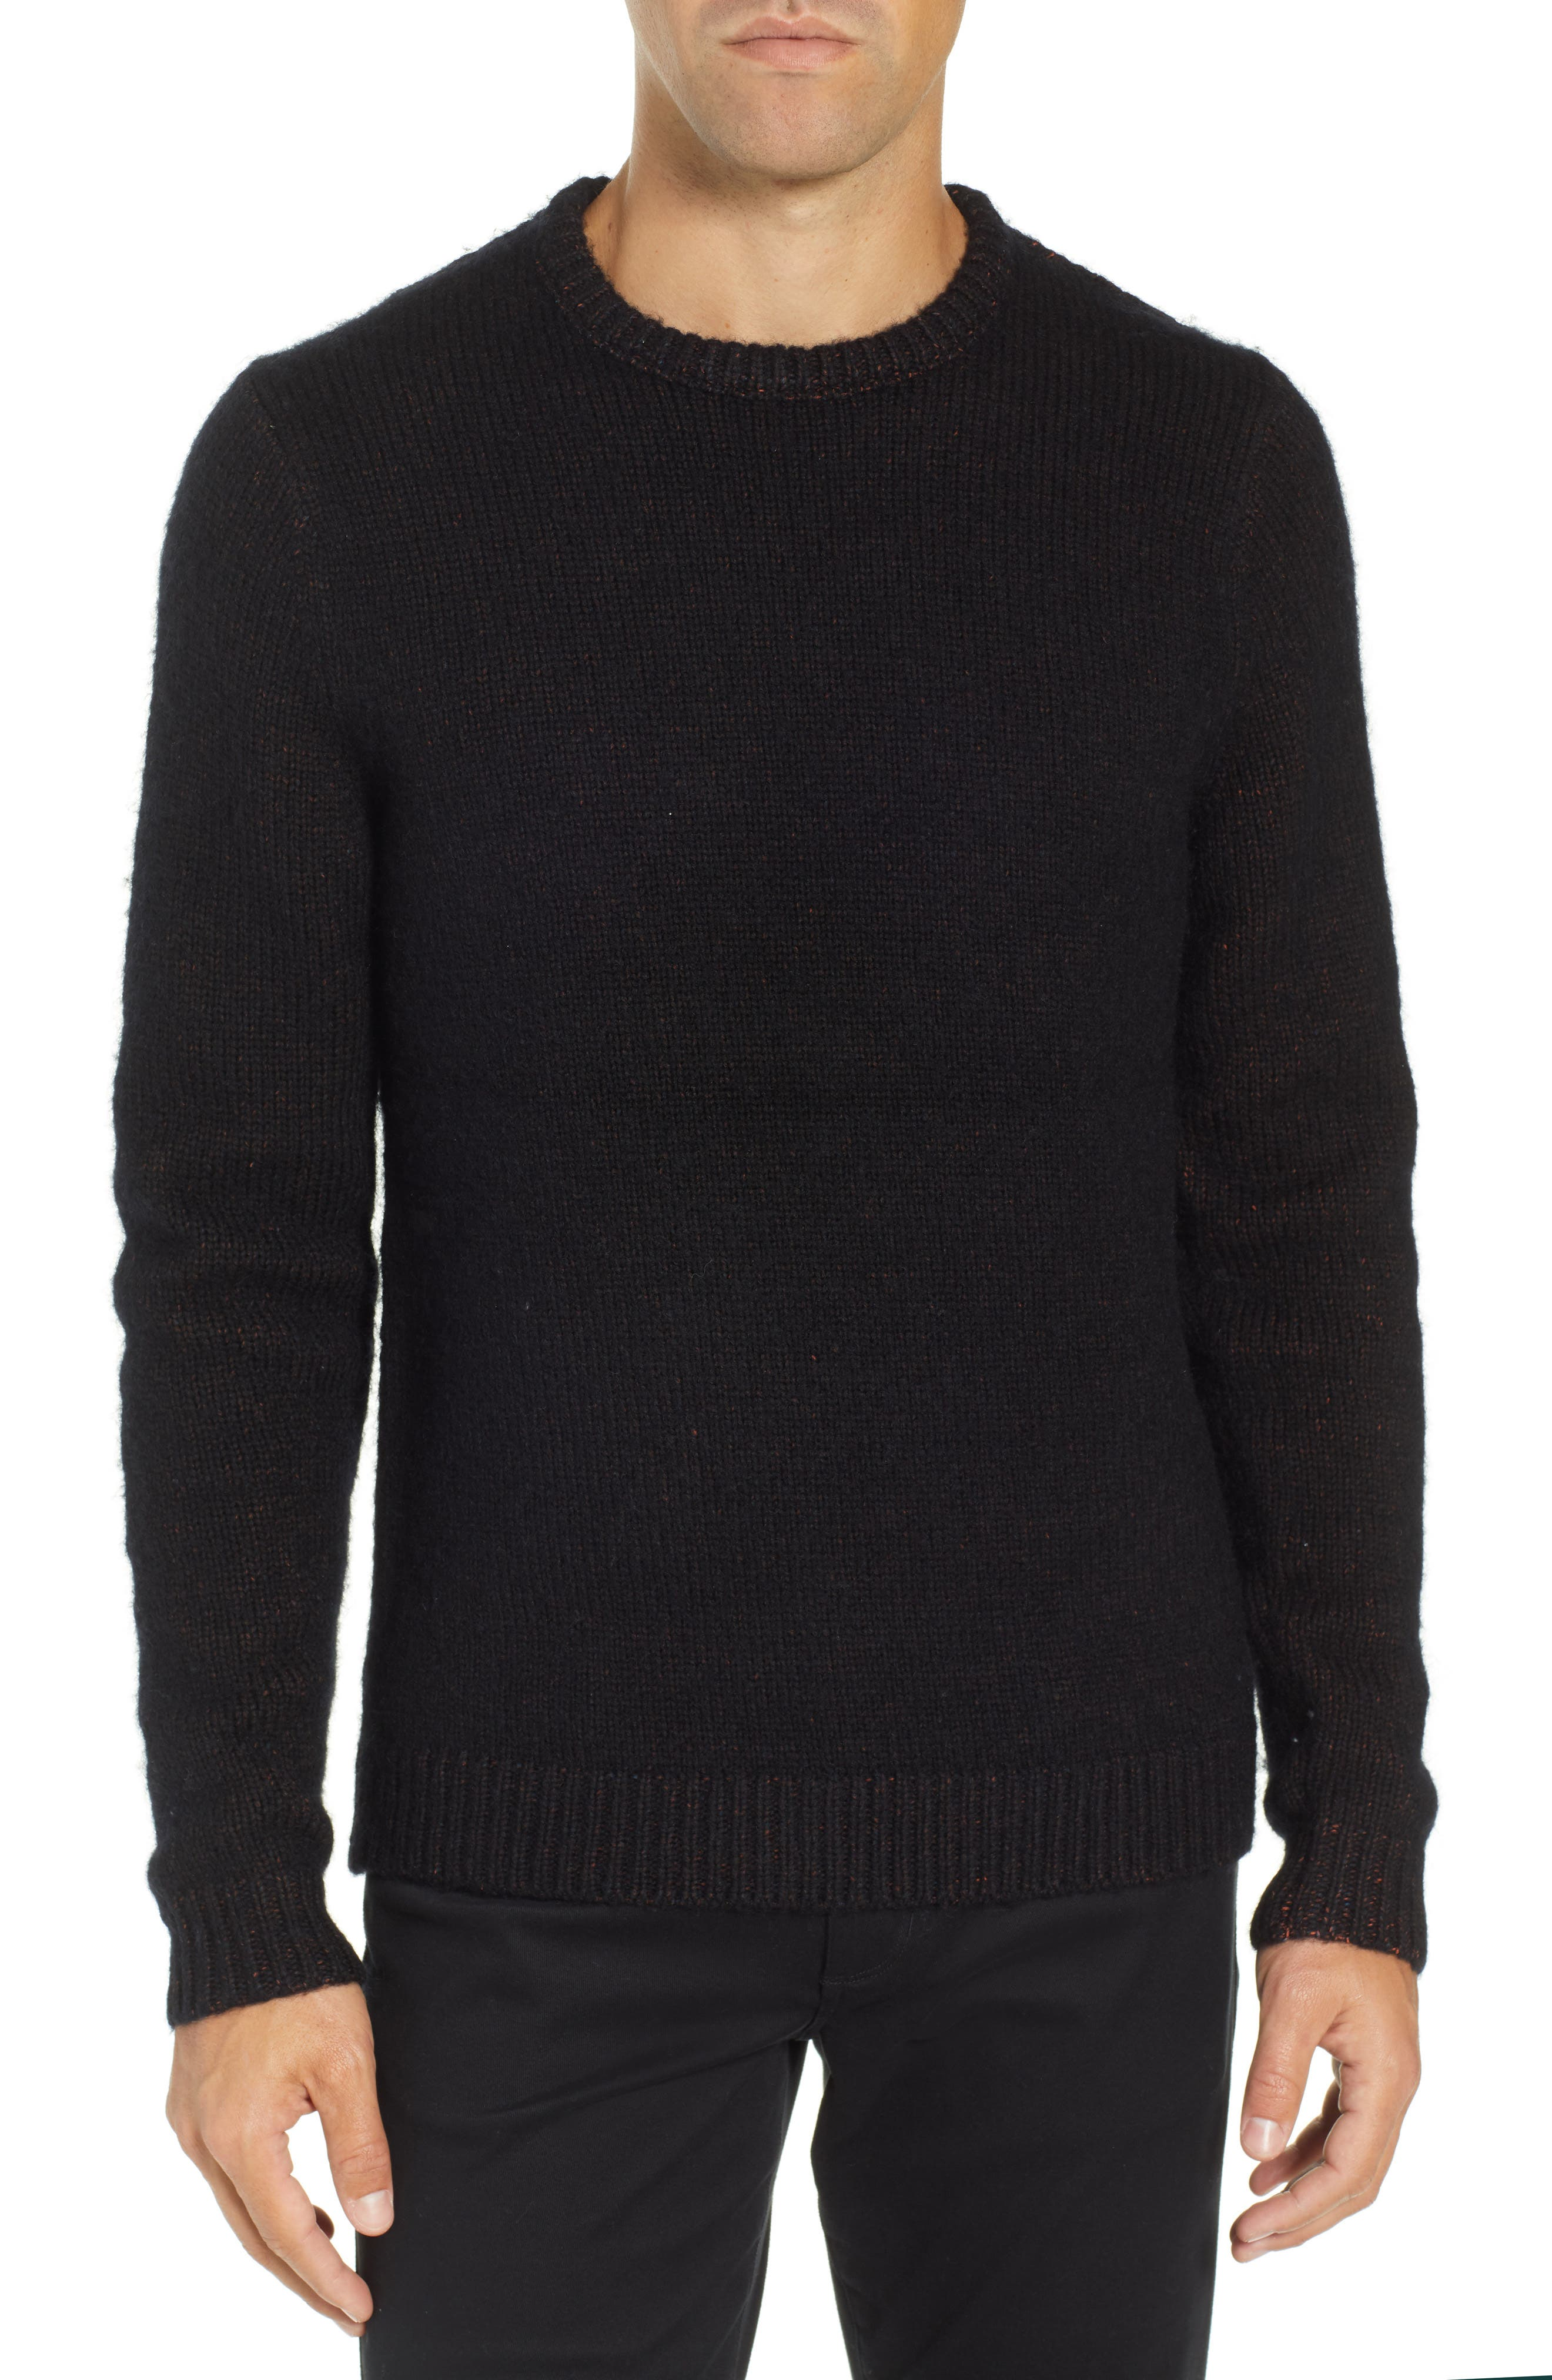 Image of CALIBRATE Chunky Crewneck Sweater